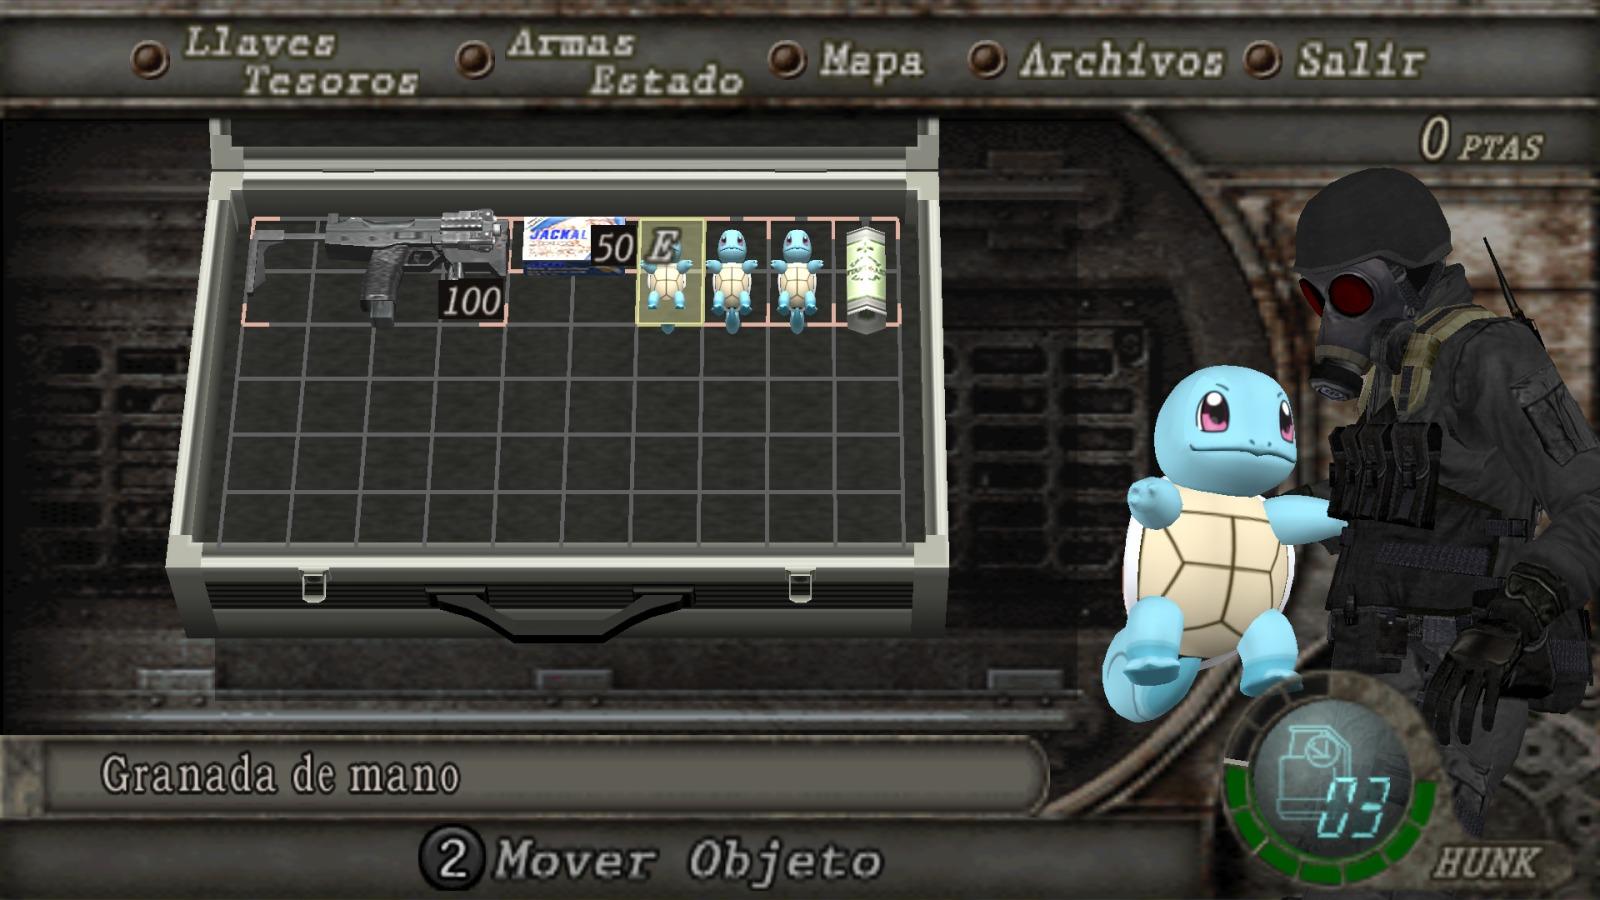 Pikachu,Charmander,Bulbasaur,Squirtle - Pokémon X/Y (N3DS) - por granadas 2j4253l